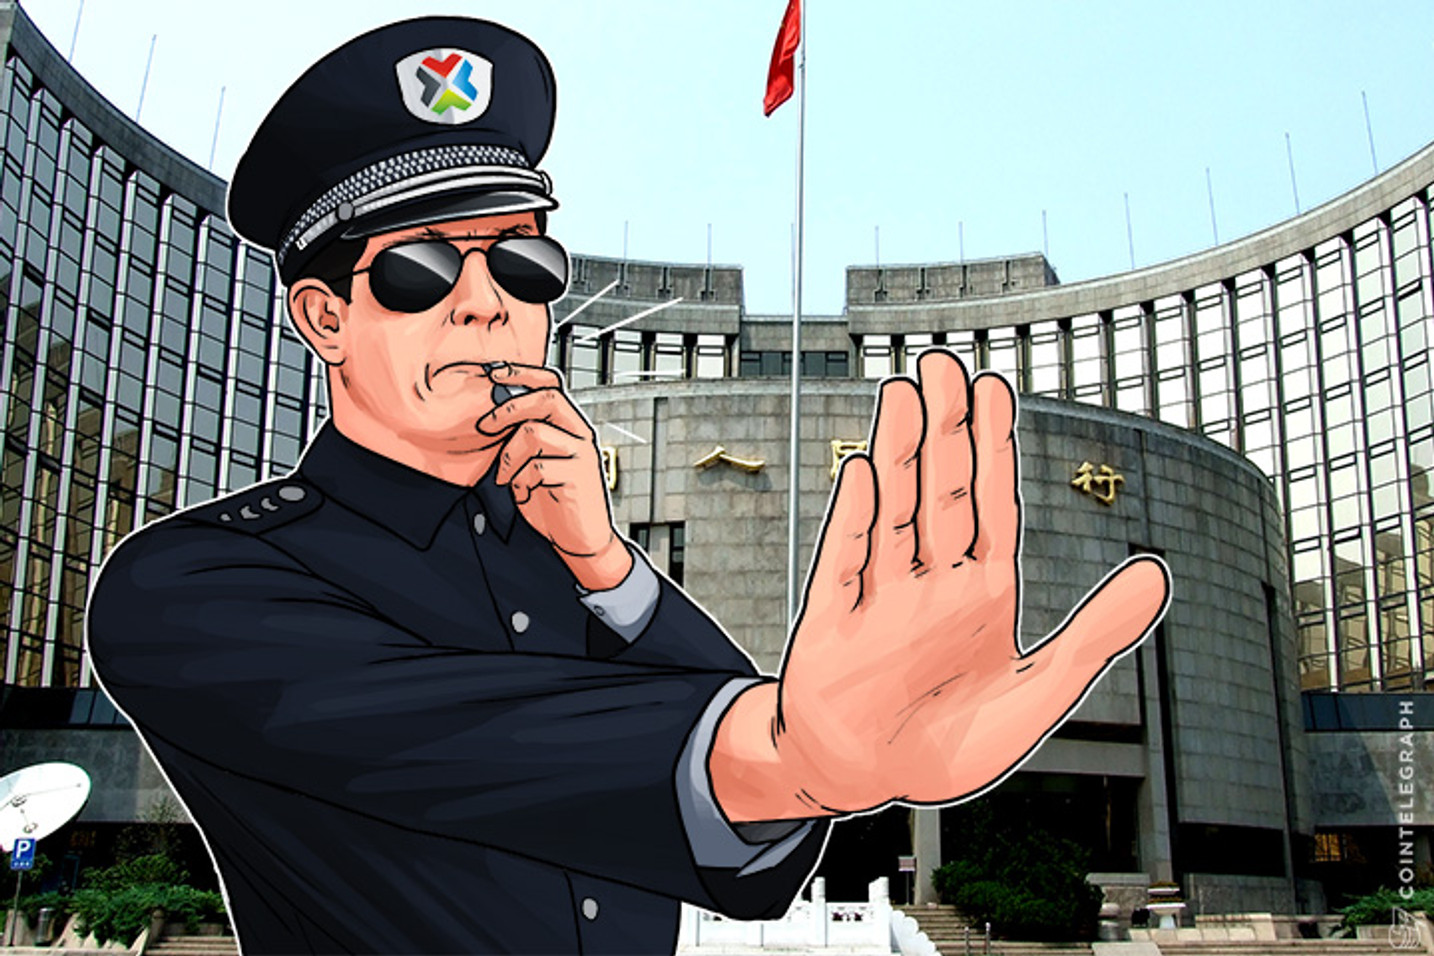 Bitcoin Price Shrugs Off BTCC Joining OKCoin, Huobi in Bitcoin, Litecoin Suspension